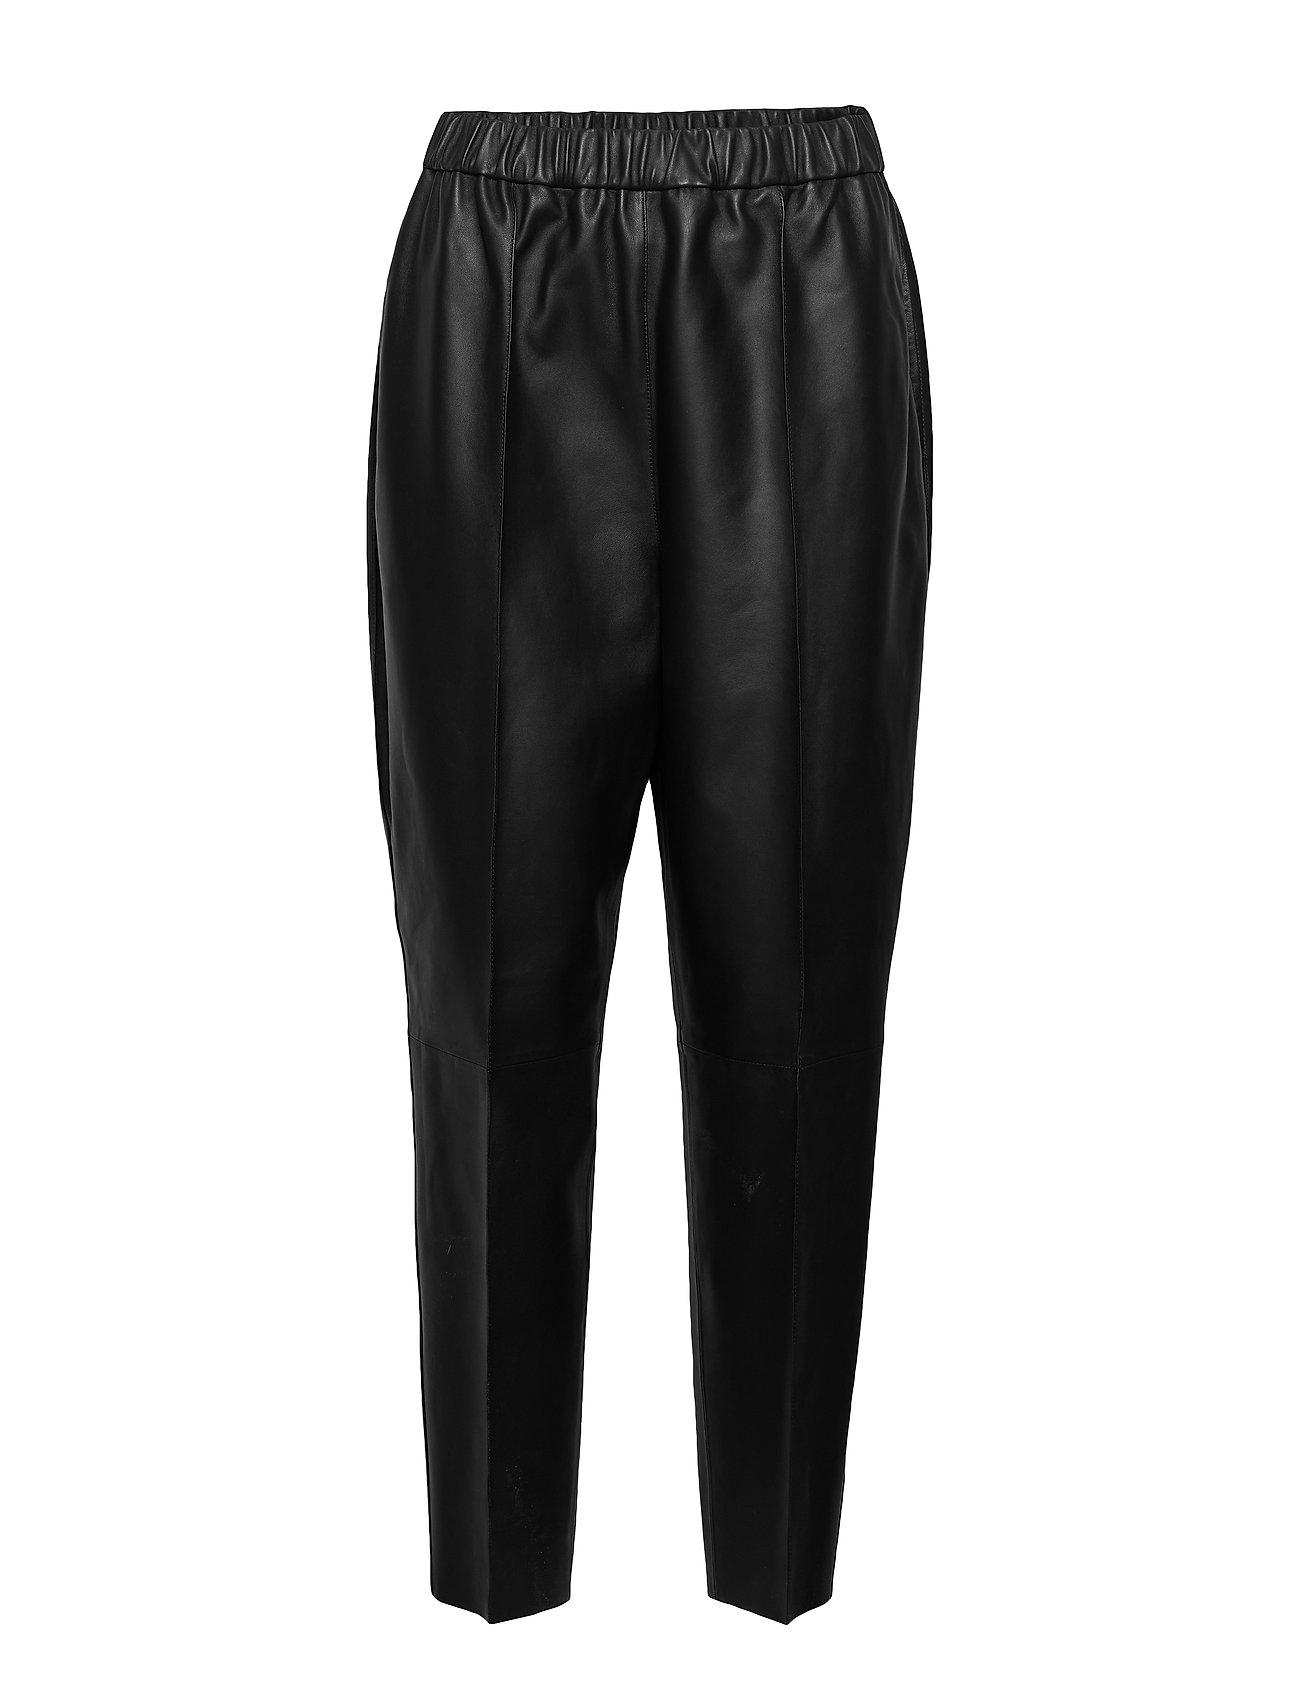 Image of Arecia Leather Leggings/Bukser Sort By Malene Birger (3414560279)